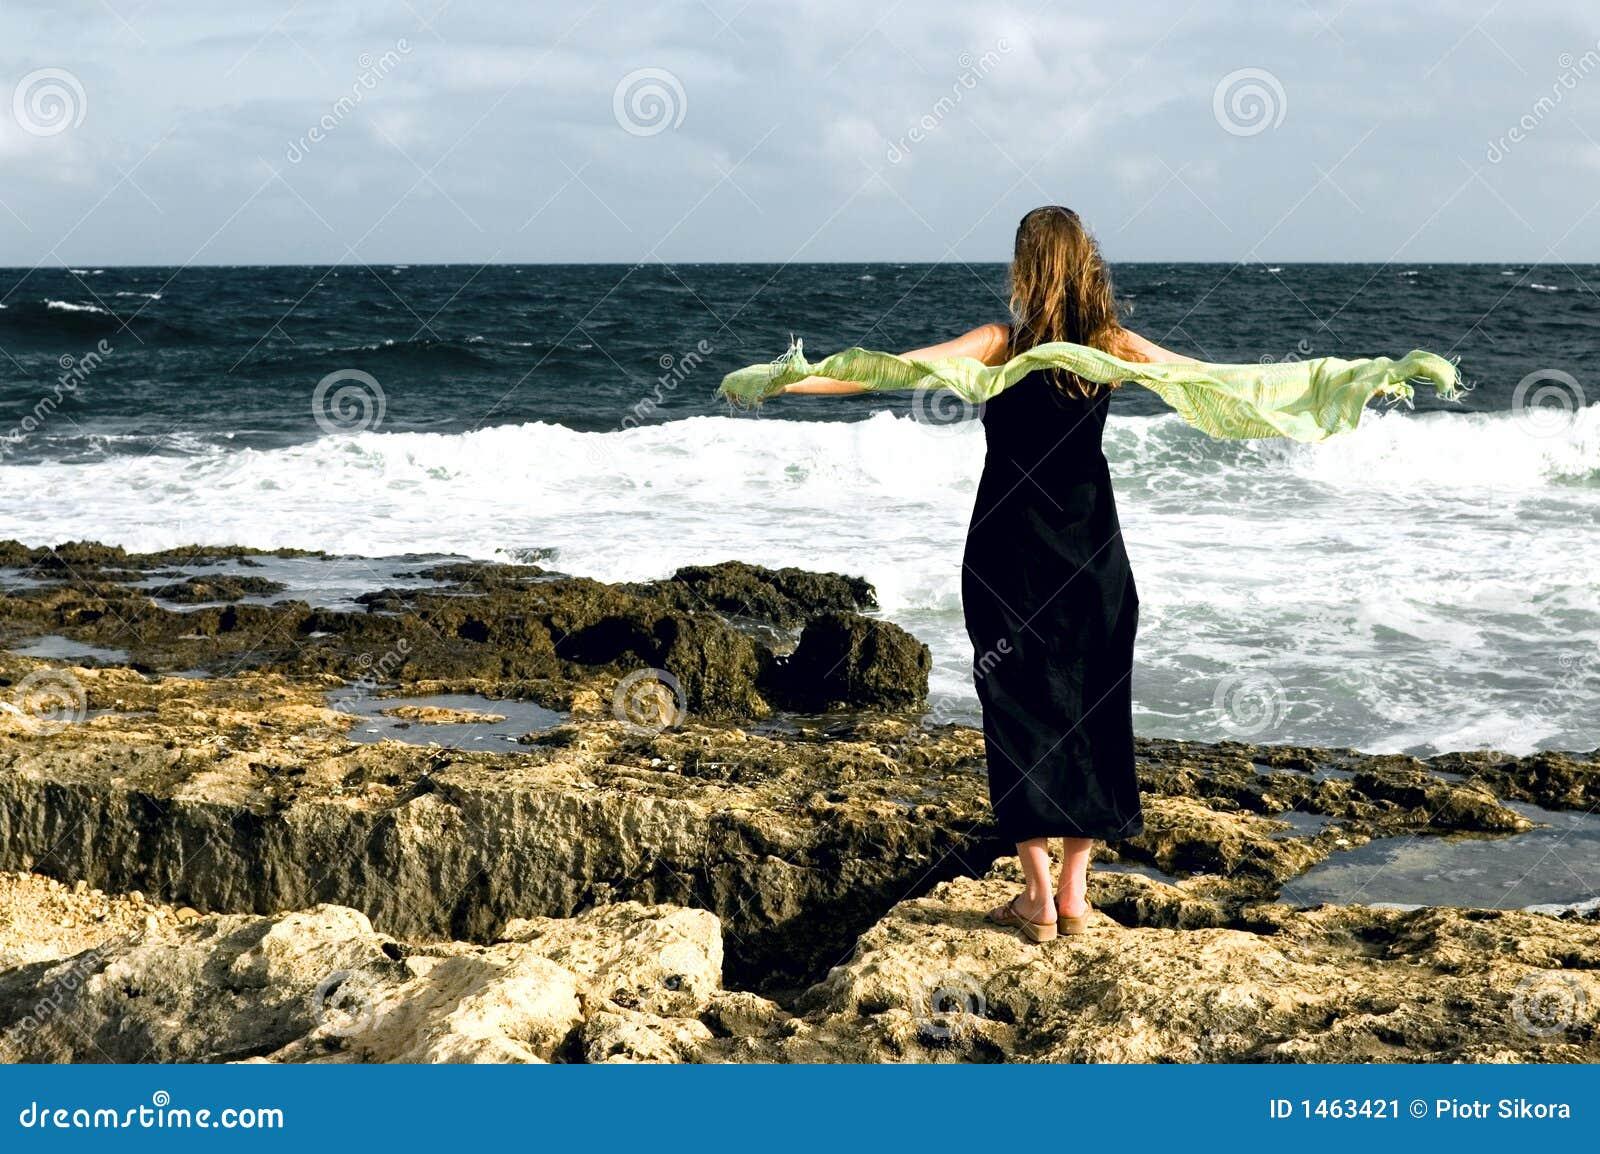 femme restant au bord de la mer jour venteux image stock image 1463421. Black Bedroom Furniture Sets. Home Design Ideas